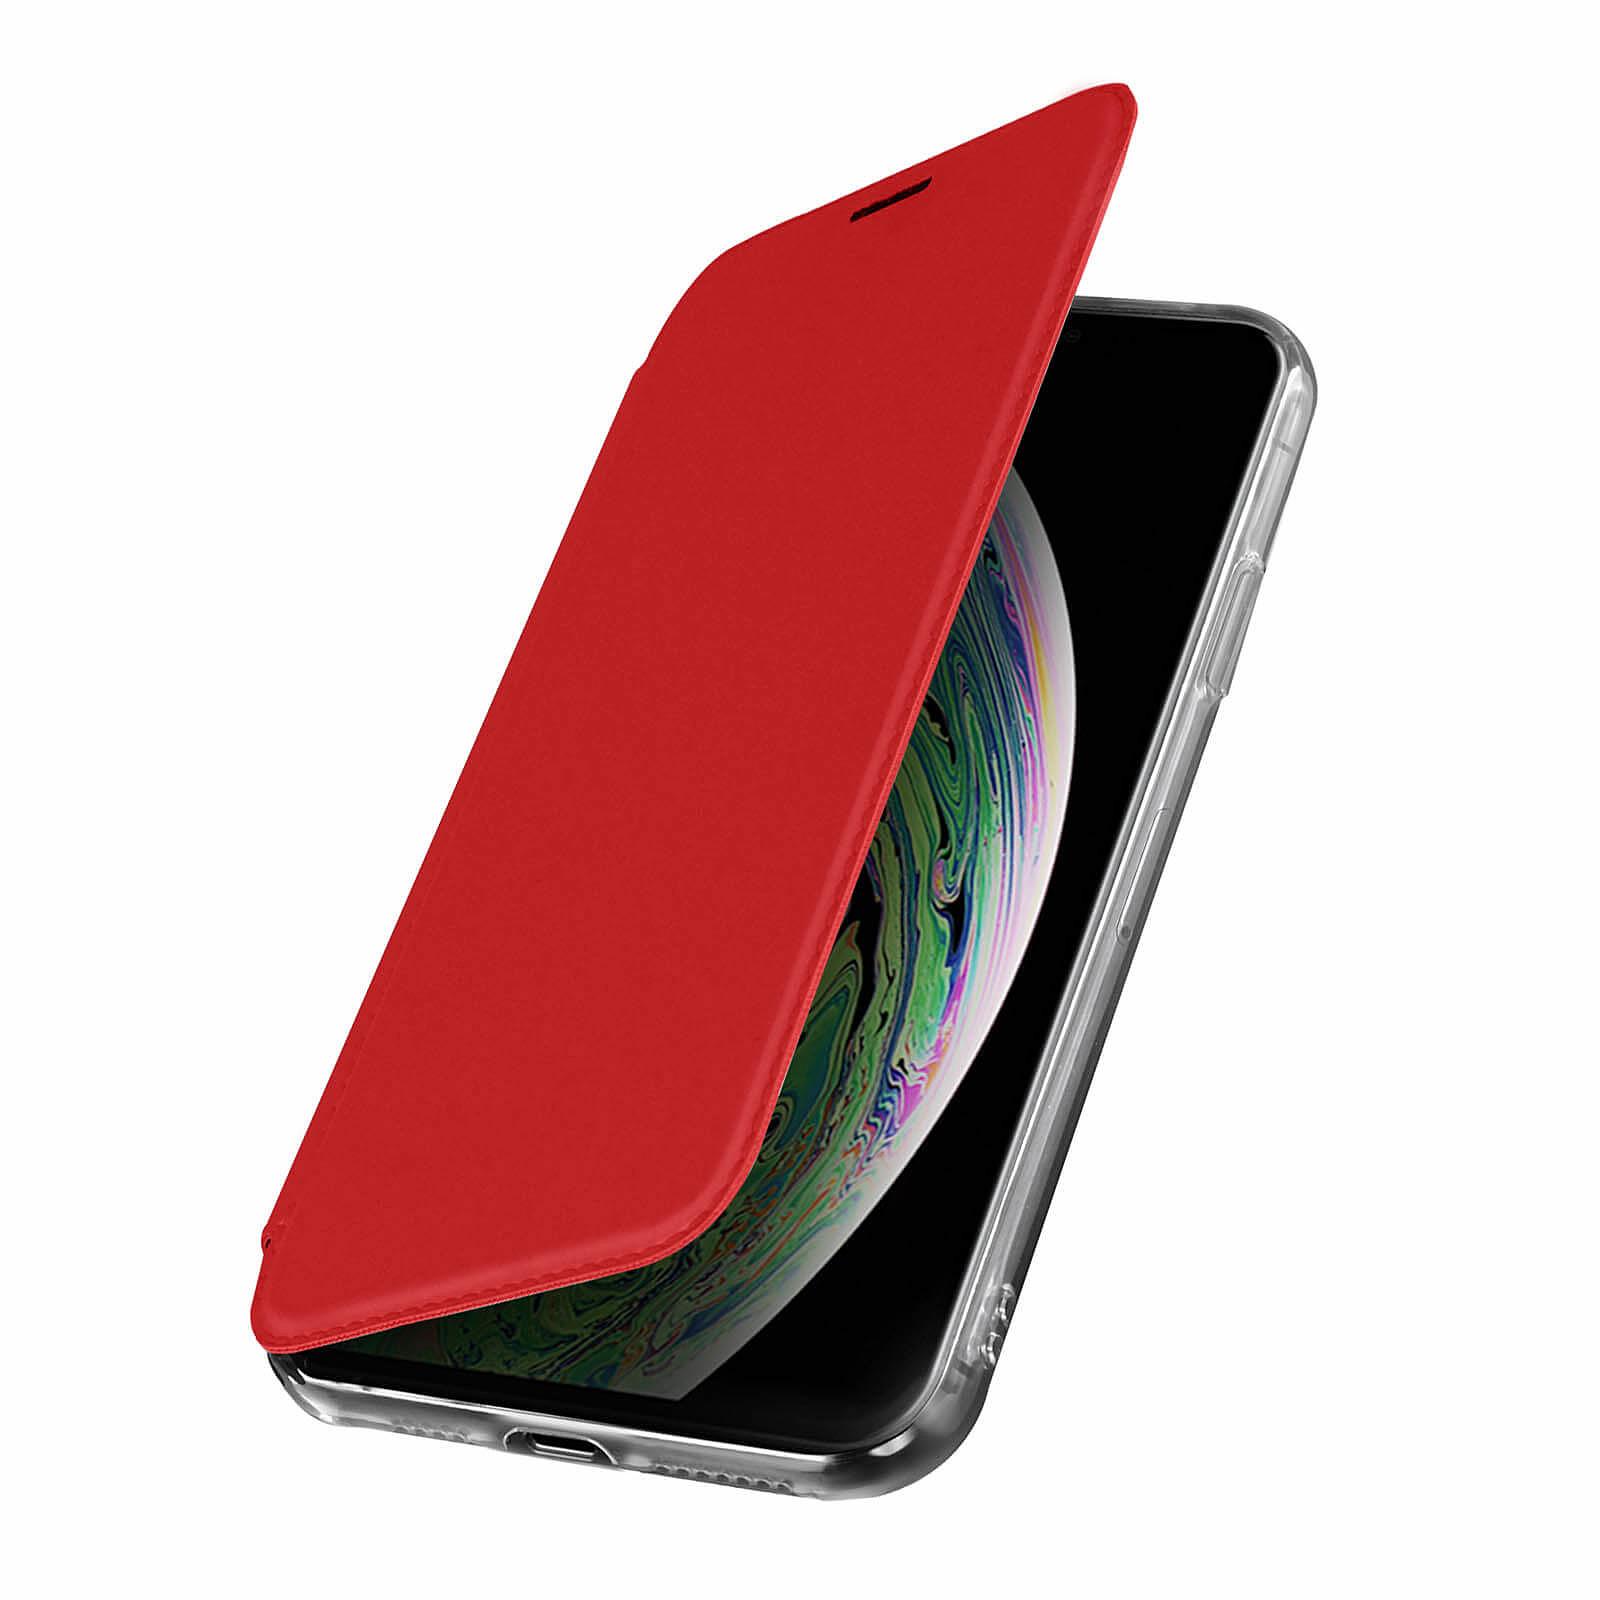 Avizar Etui folio Rouge Miroir pour Apple iPhone XS Max